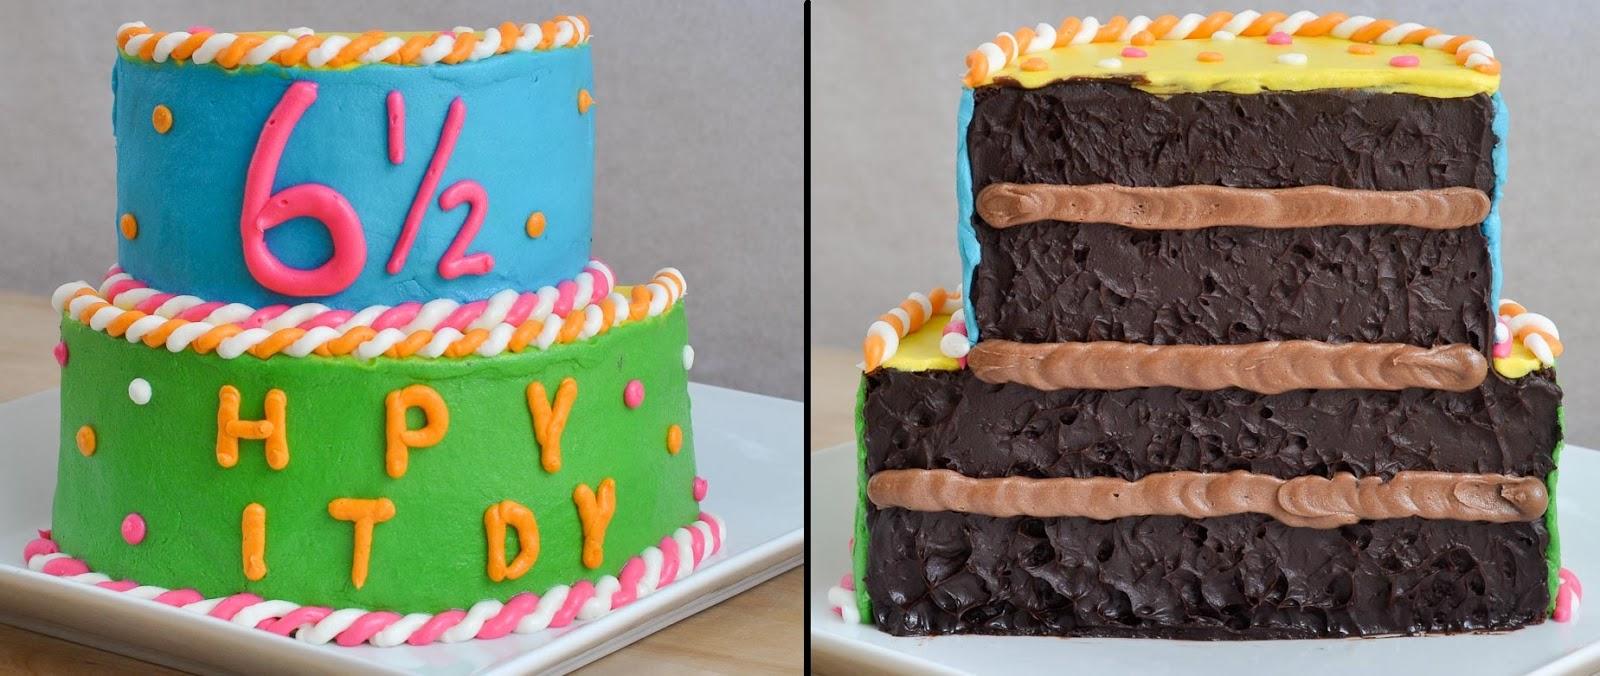 Beki Cooks Cake Blog HalfBirthday HalfCake